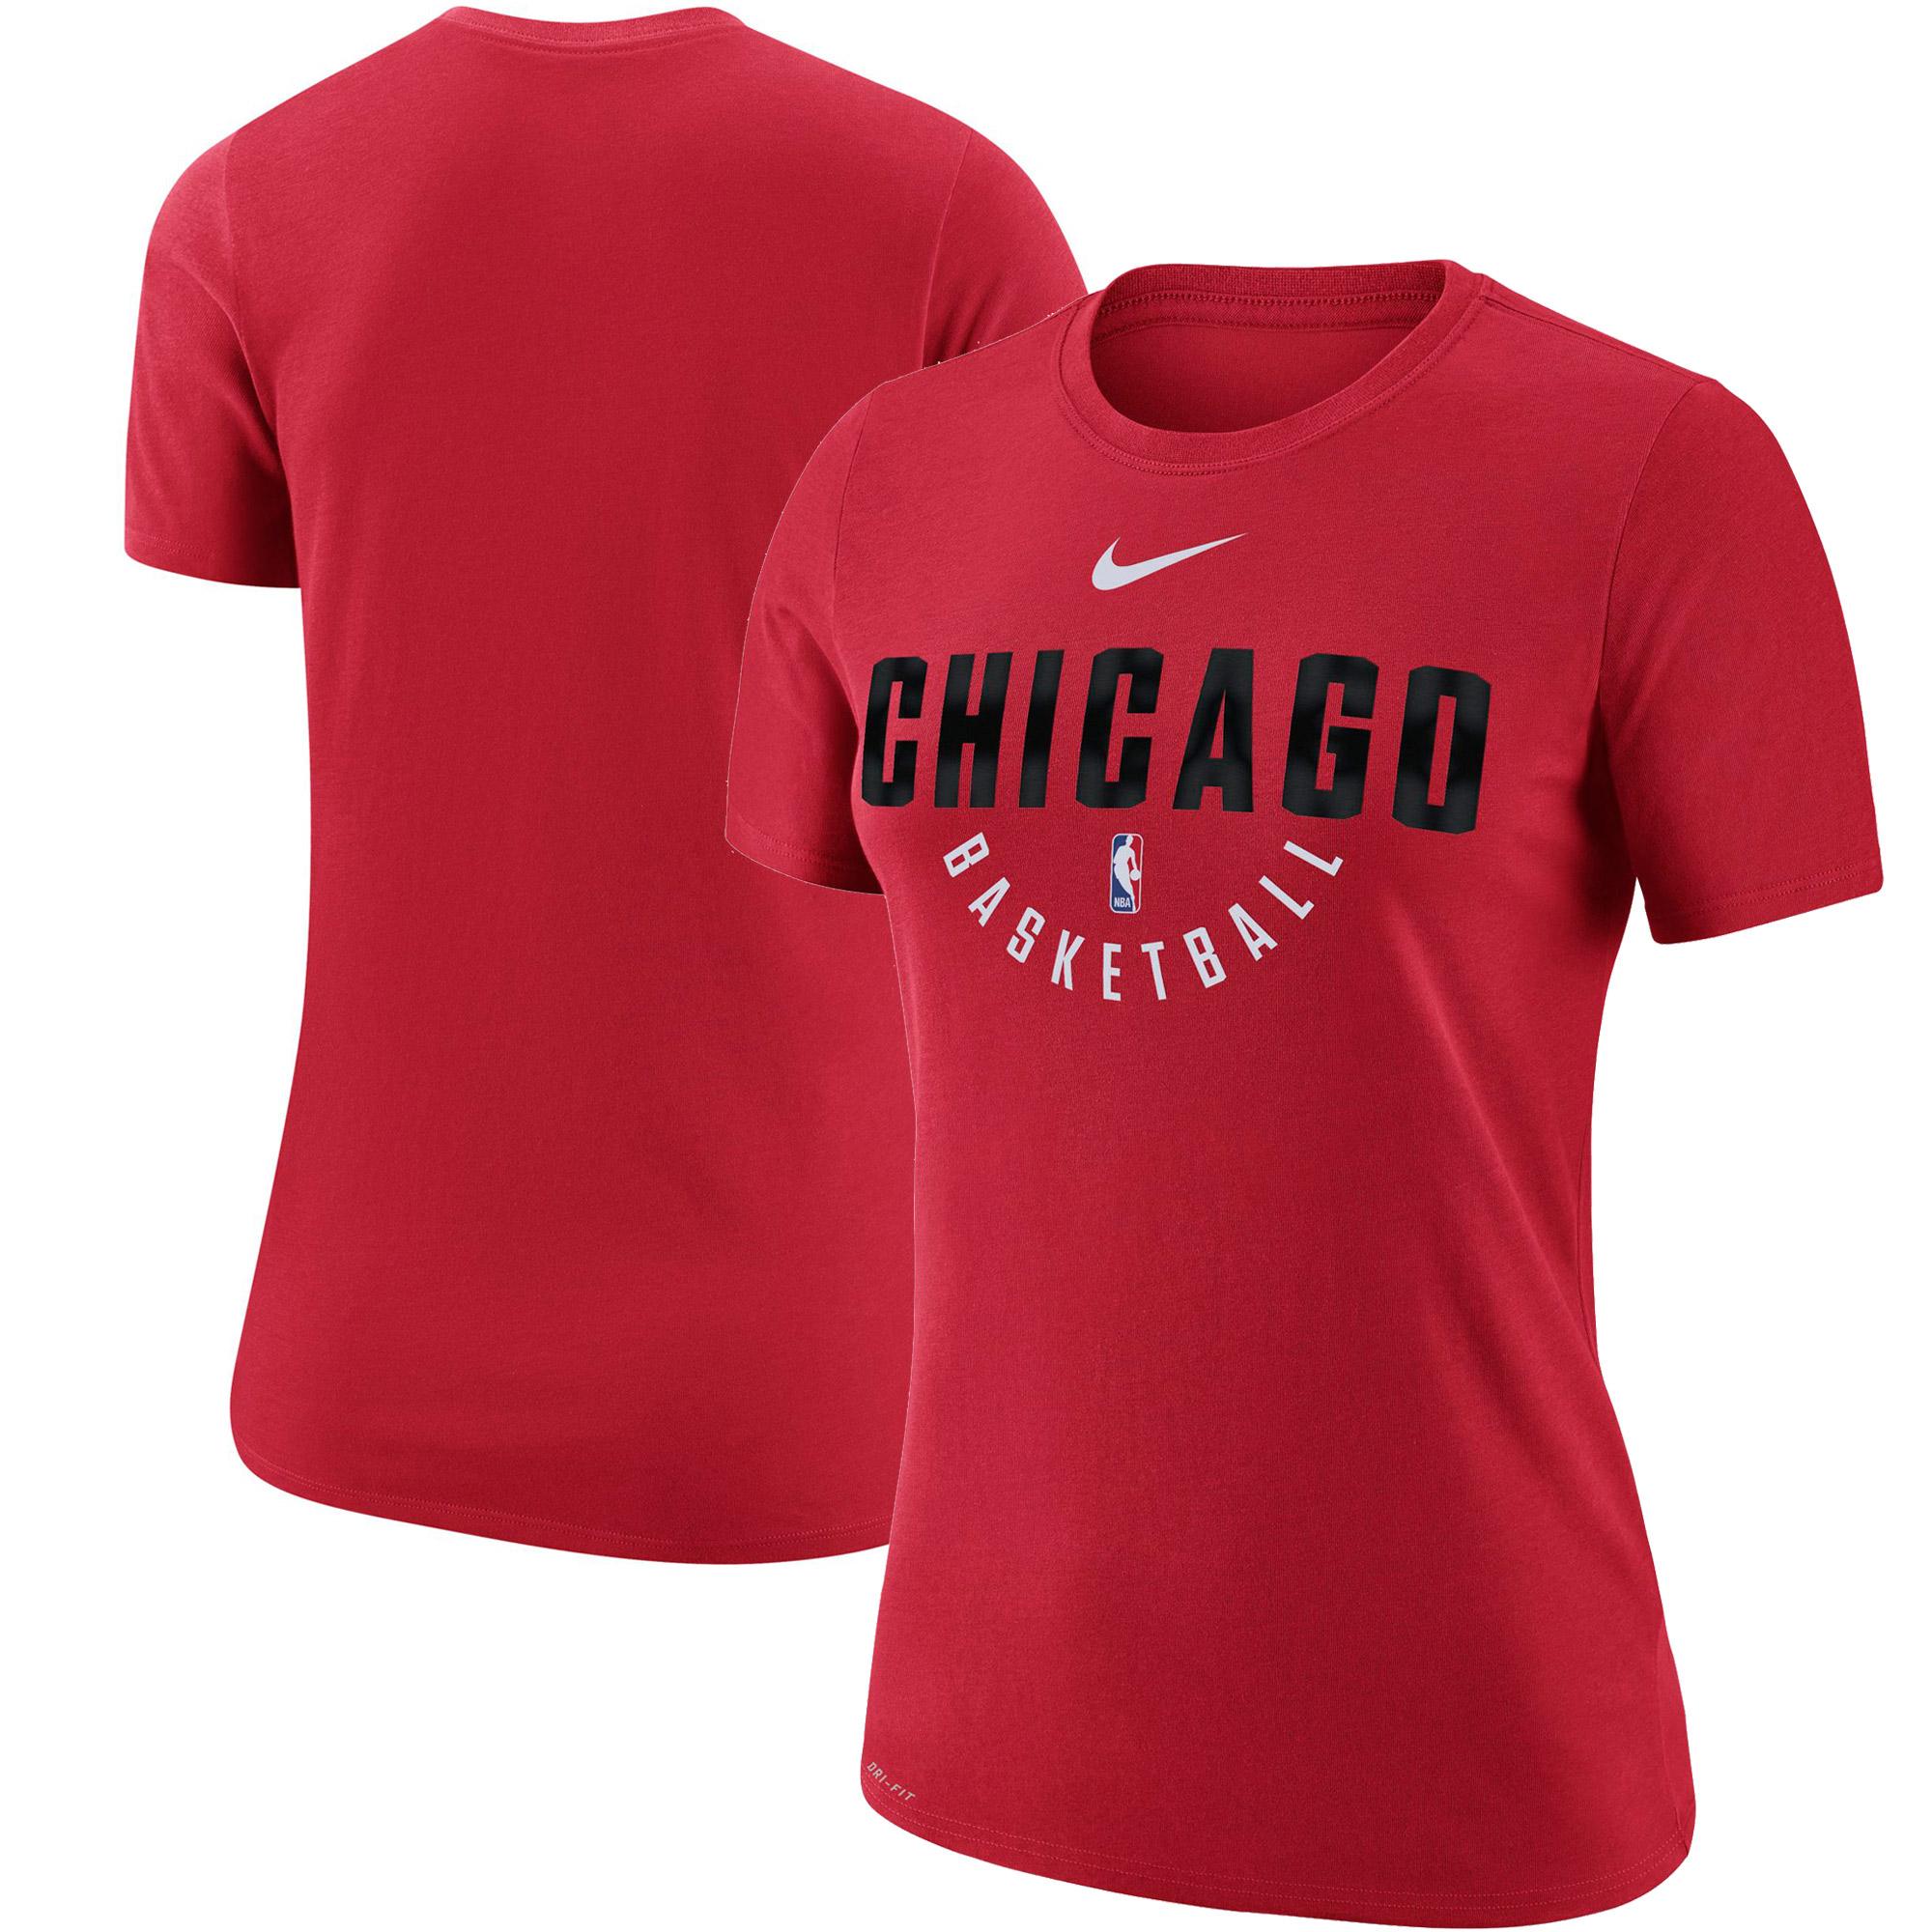 Chicago Bulls Nike Women's Practice Performance T-Shirt - Red